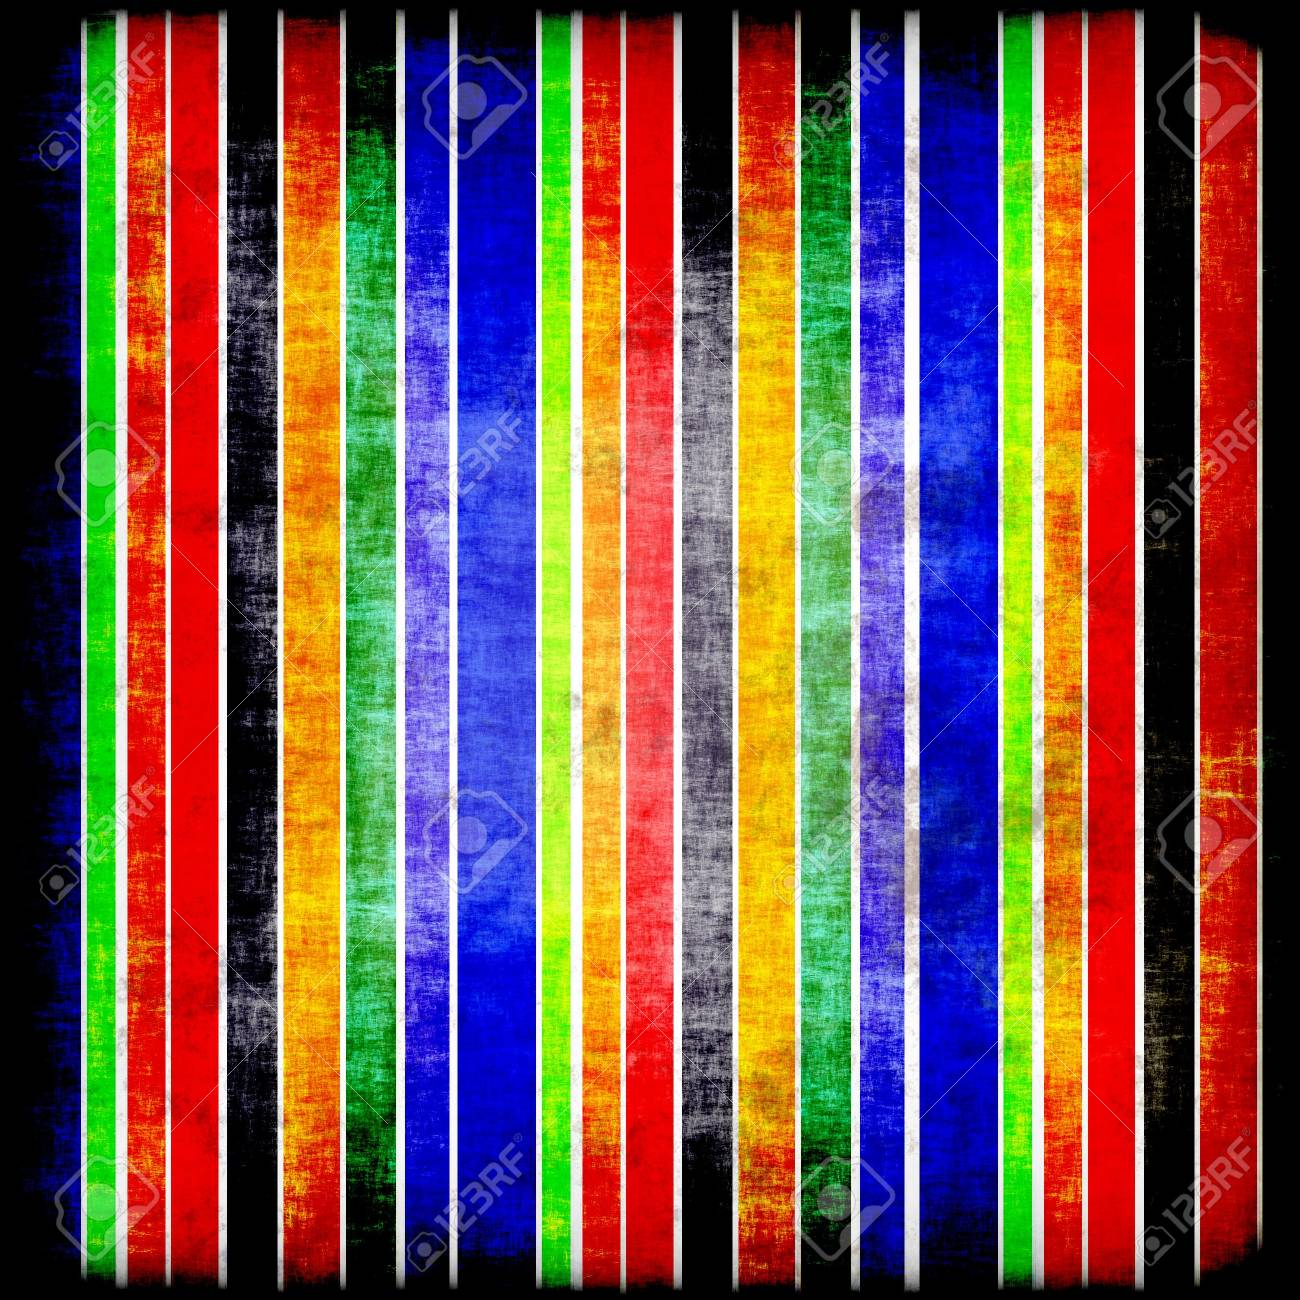 grunge stripes Stock Photo - 10869506